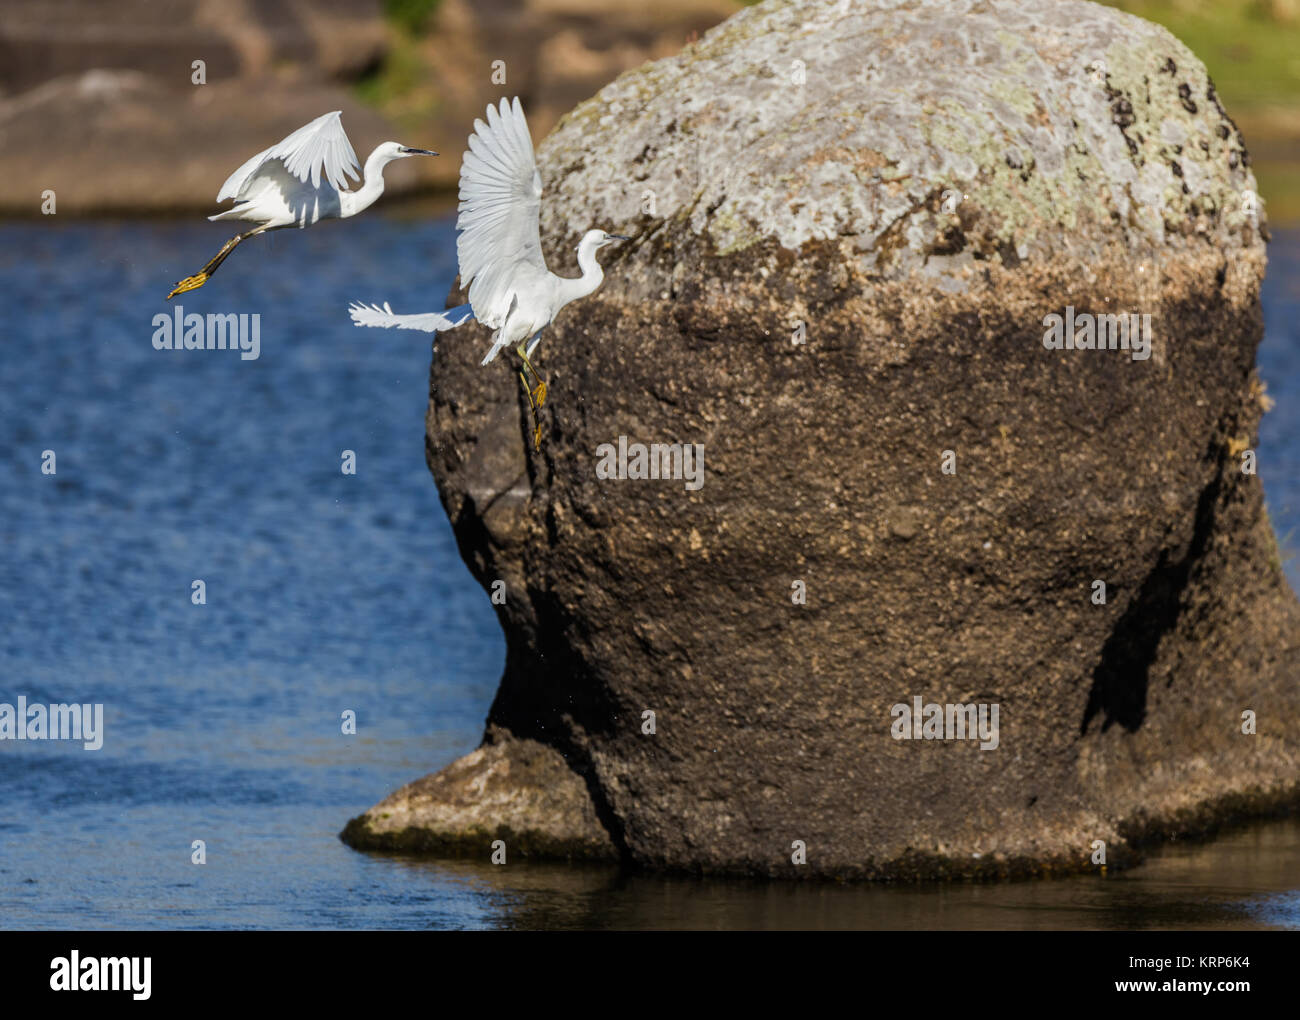 Dos garzas fotografiados en su entorno natural. Imagen De Stock